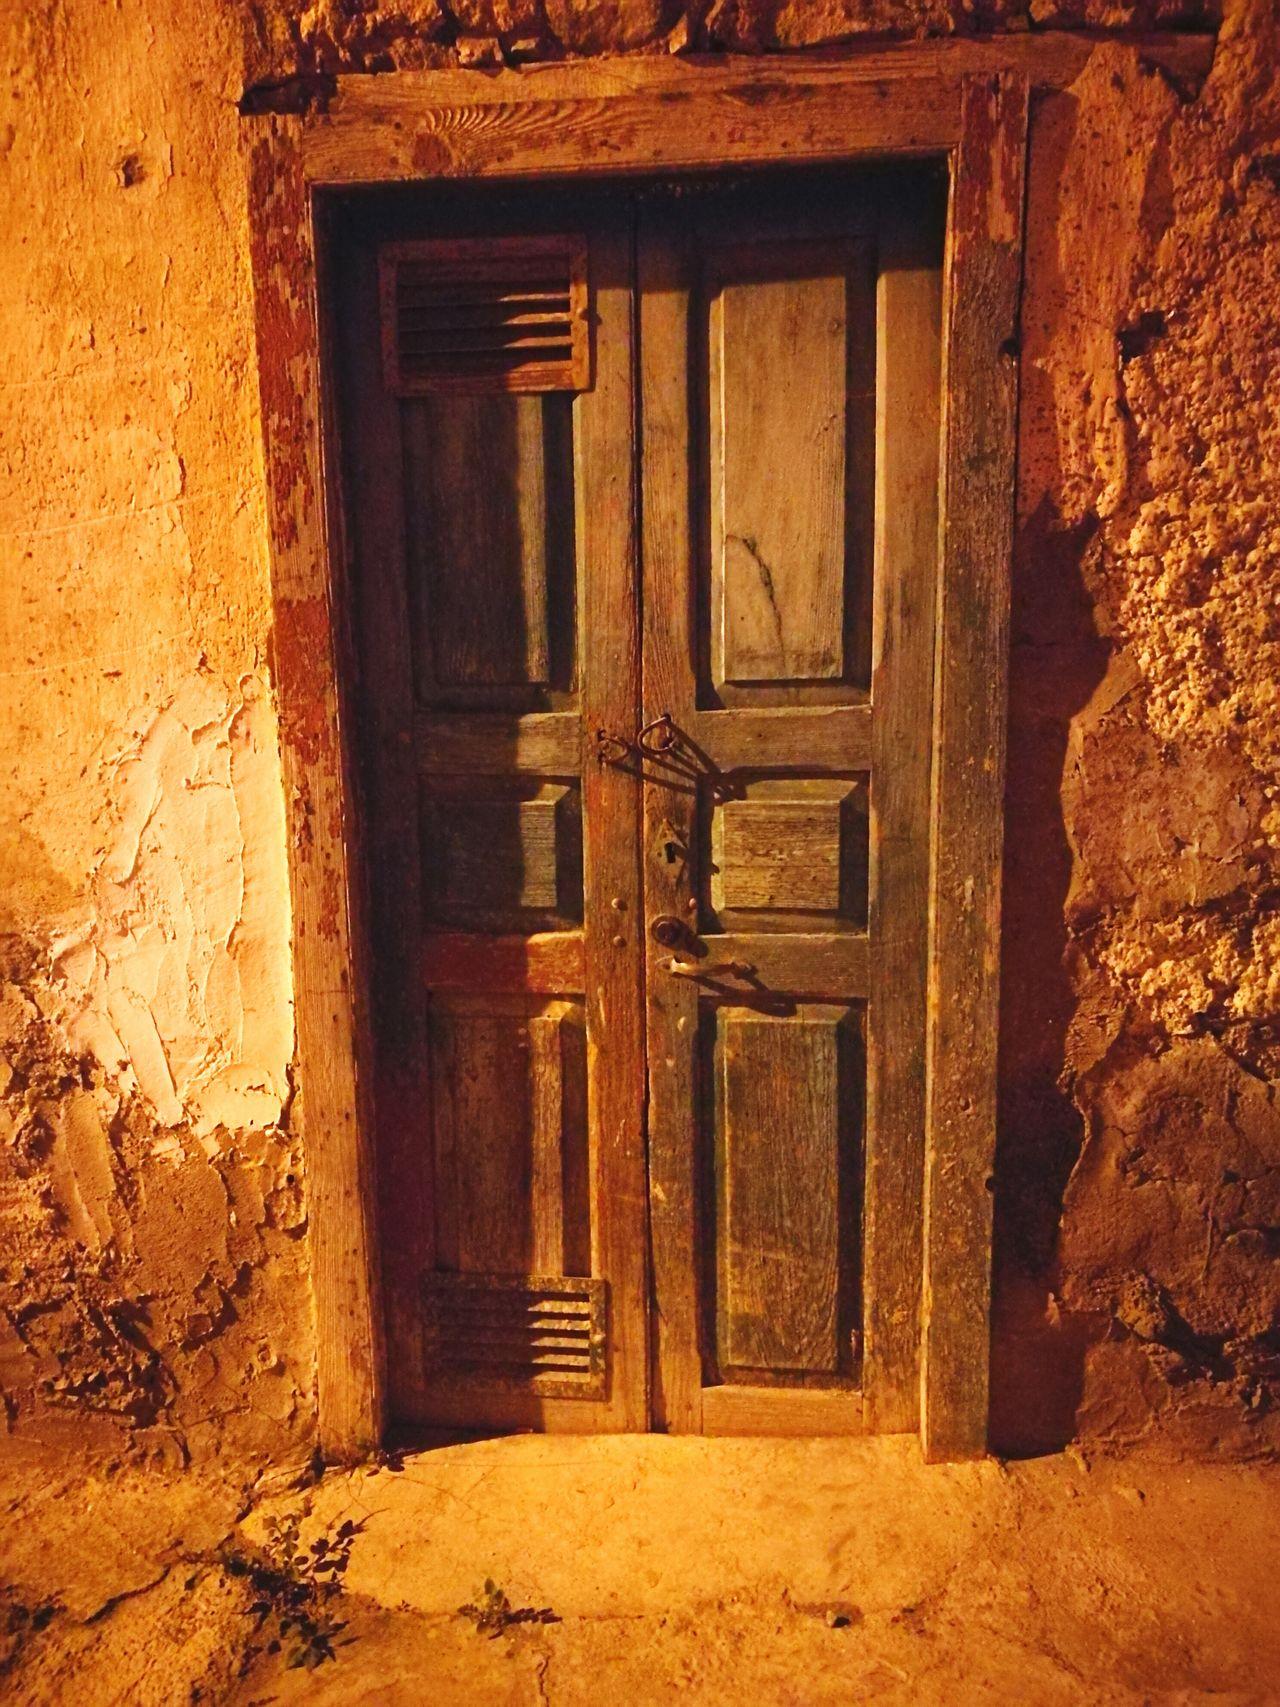 Door Closed Entrance Building Exterior No People Architecture Front Door Urban Paint Decay Las Palmas De Gran Canaria GranCanaria Travel Travel Destinations Tourism Vacations Architecture